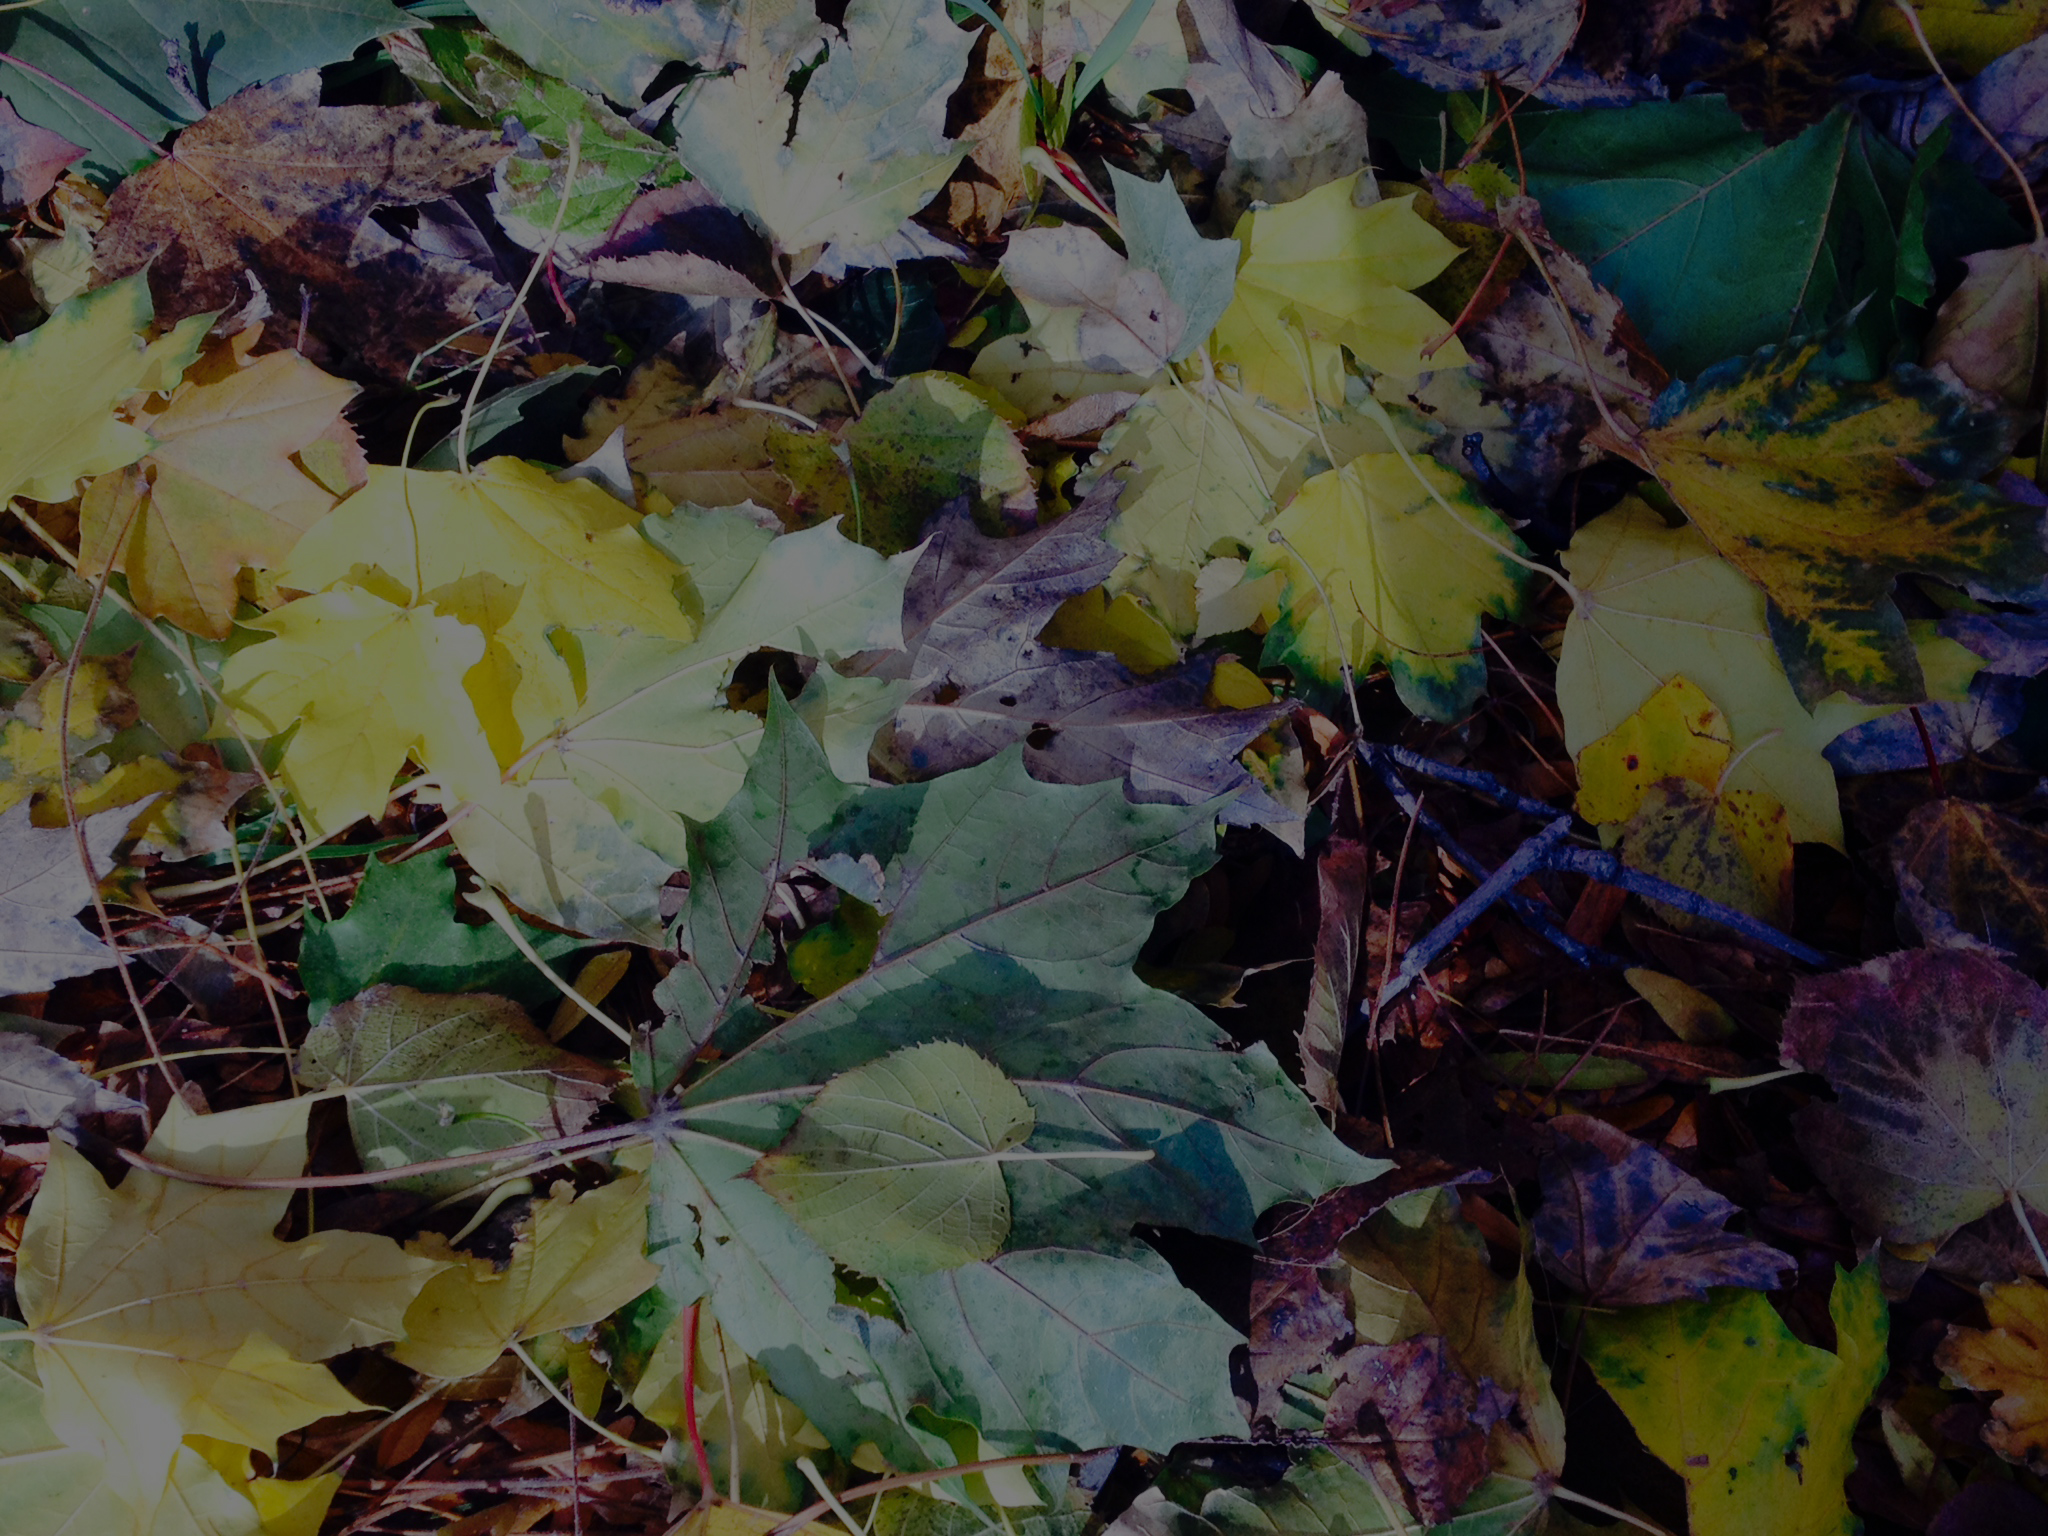 Lake-Friendly Leaves & Yard Care - Clean Lakes Alliance